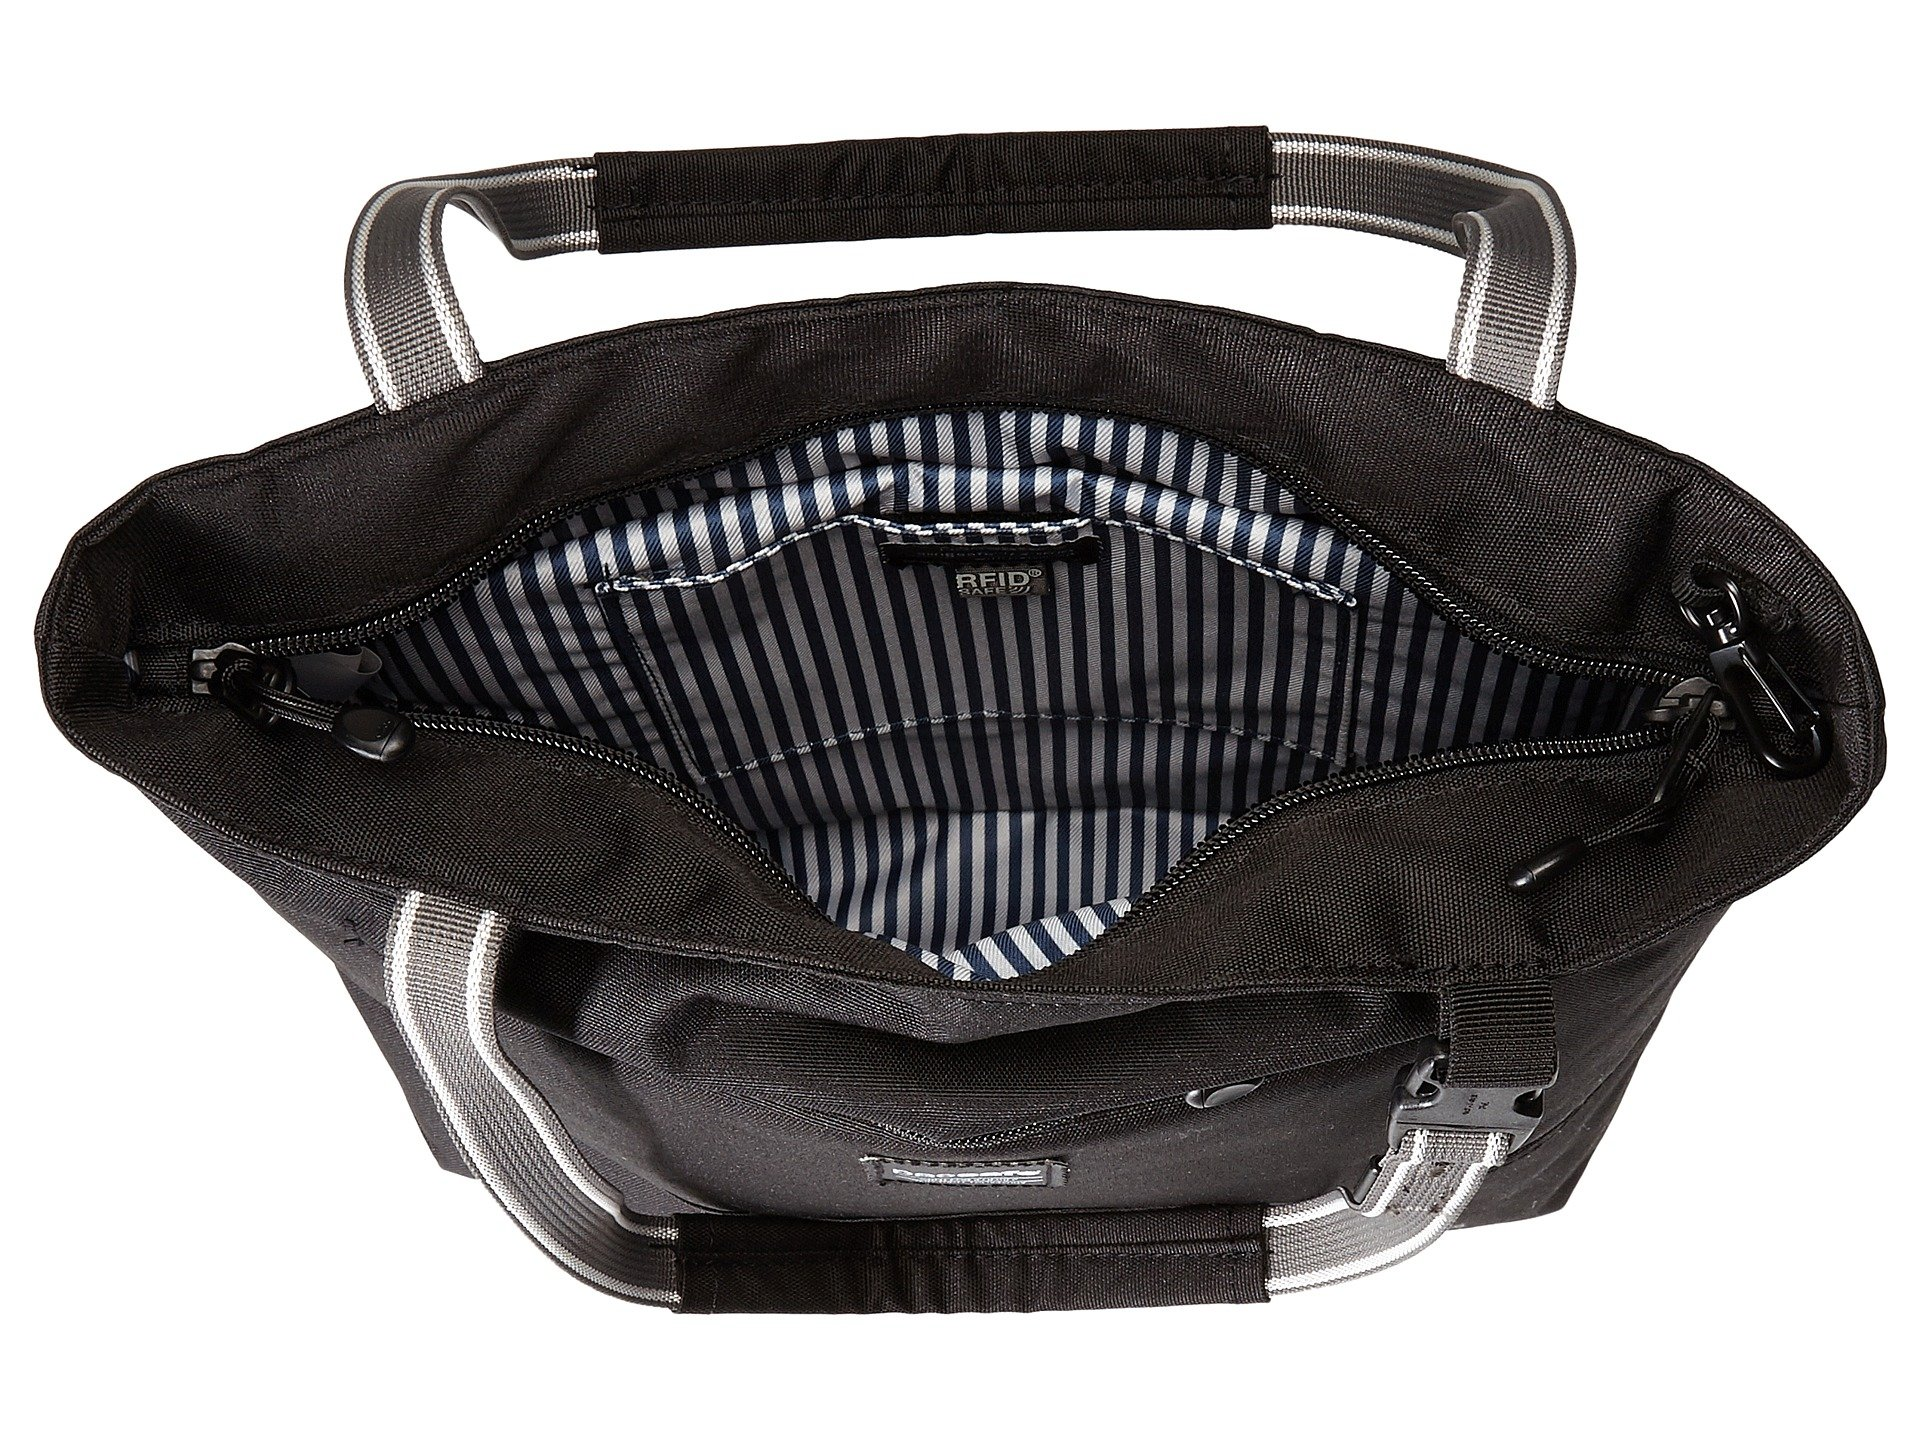 Black Tote Compact theft Bag Anti Pacsafe Lx200 Slingsafe xcWqH0FaF